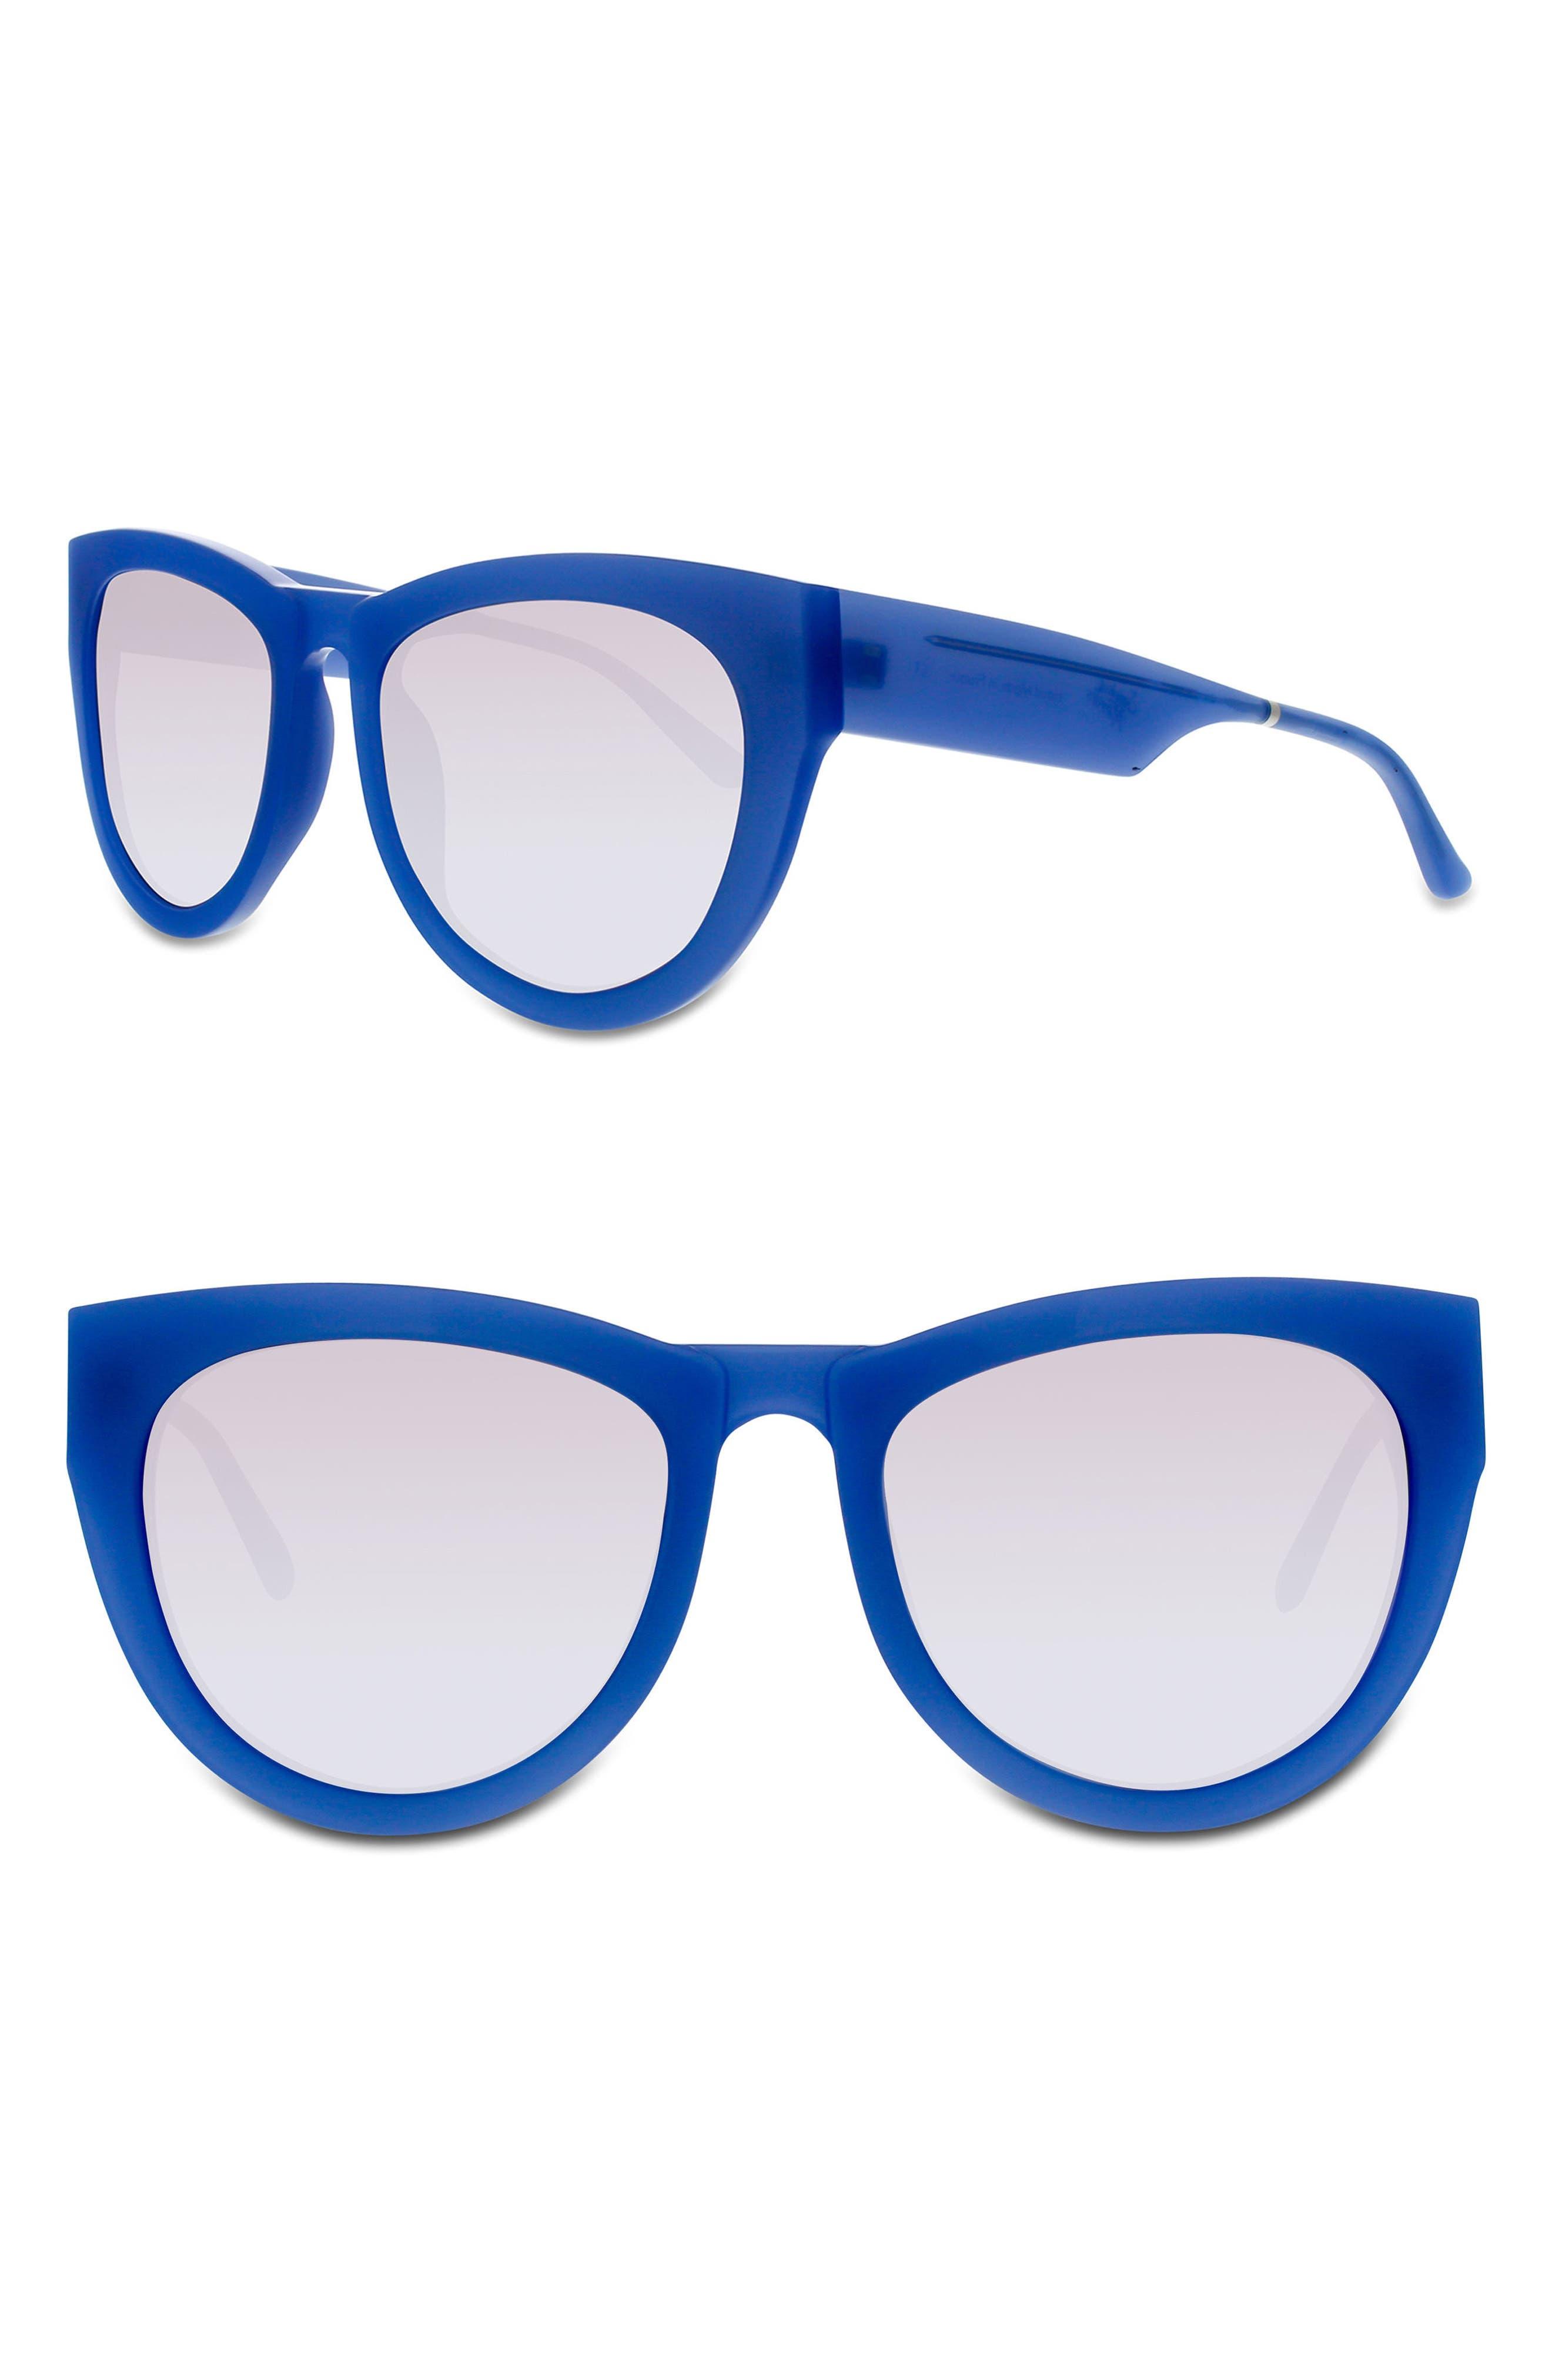 Runaround Sue 60mm Cat Eye Sunglasses,                             Main thumbnail 1, color,                             BLUE BRIGHT/ SILVER MIRROR